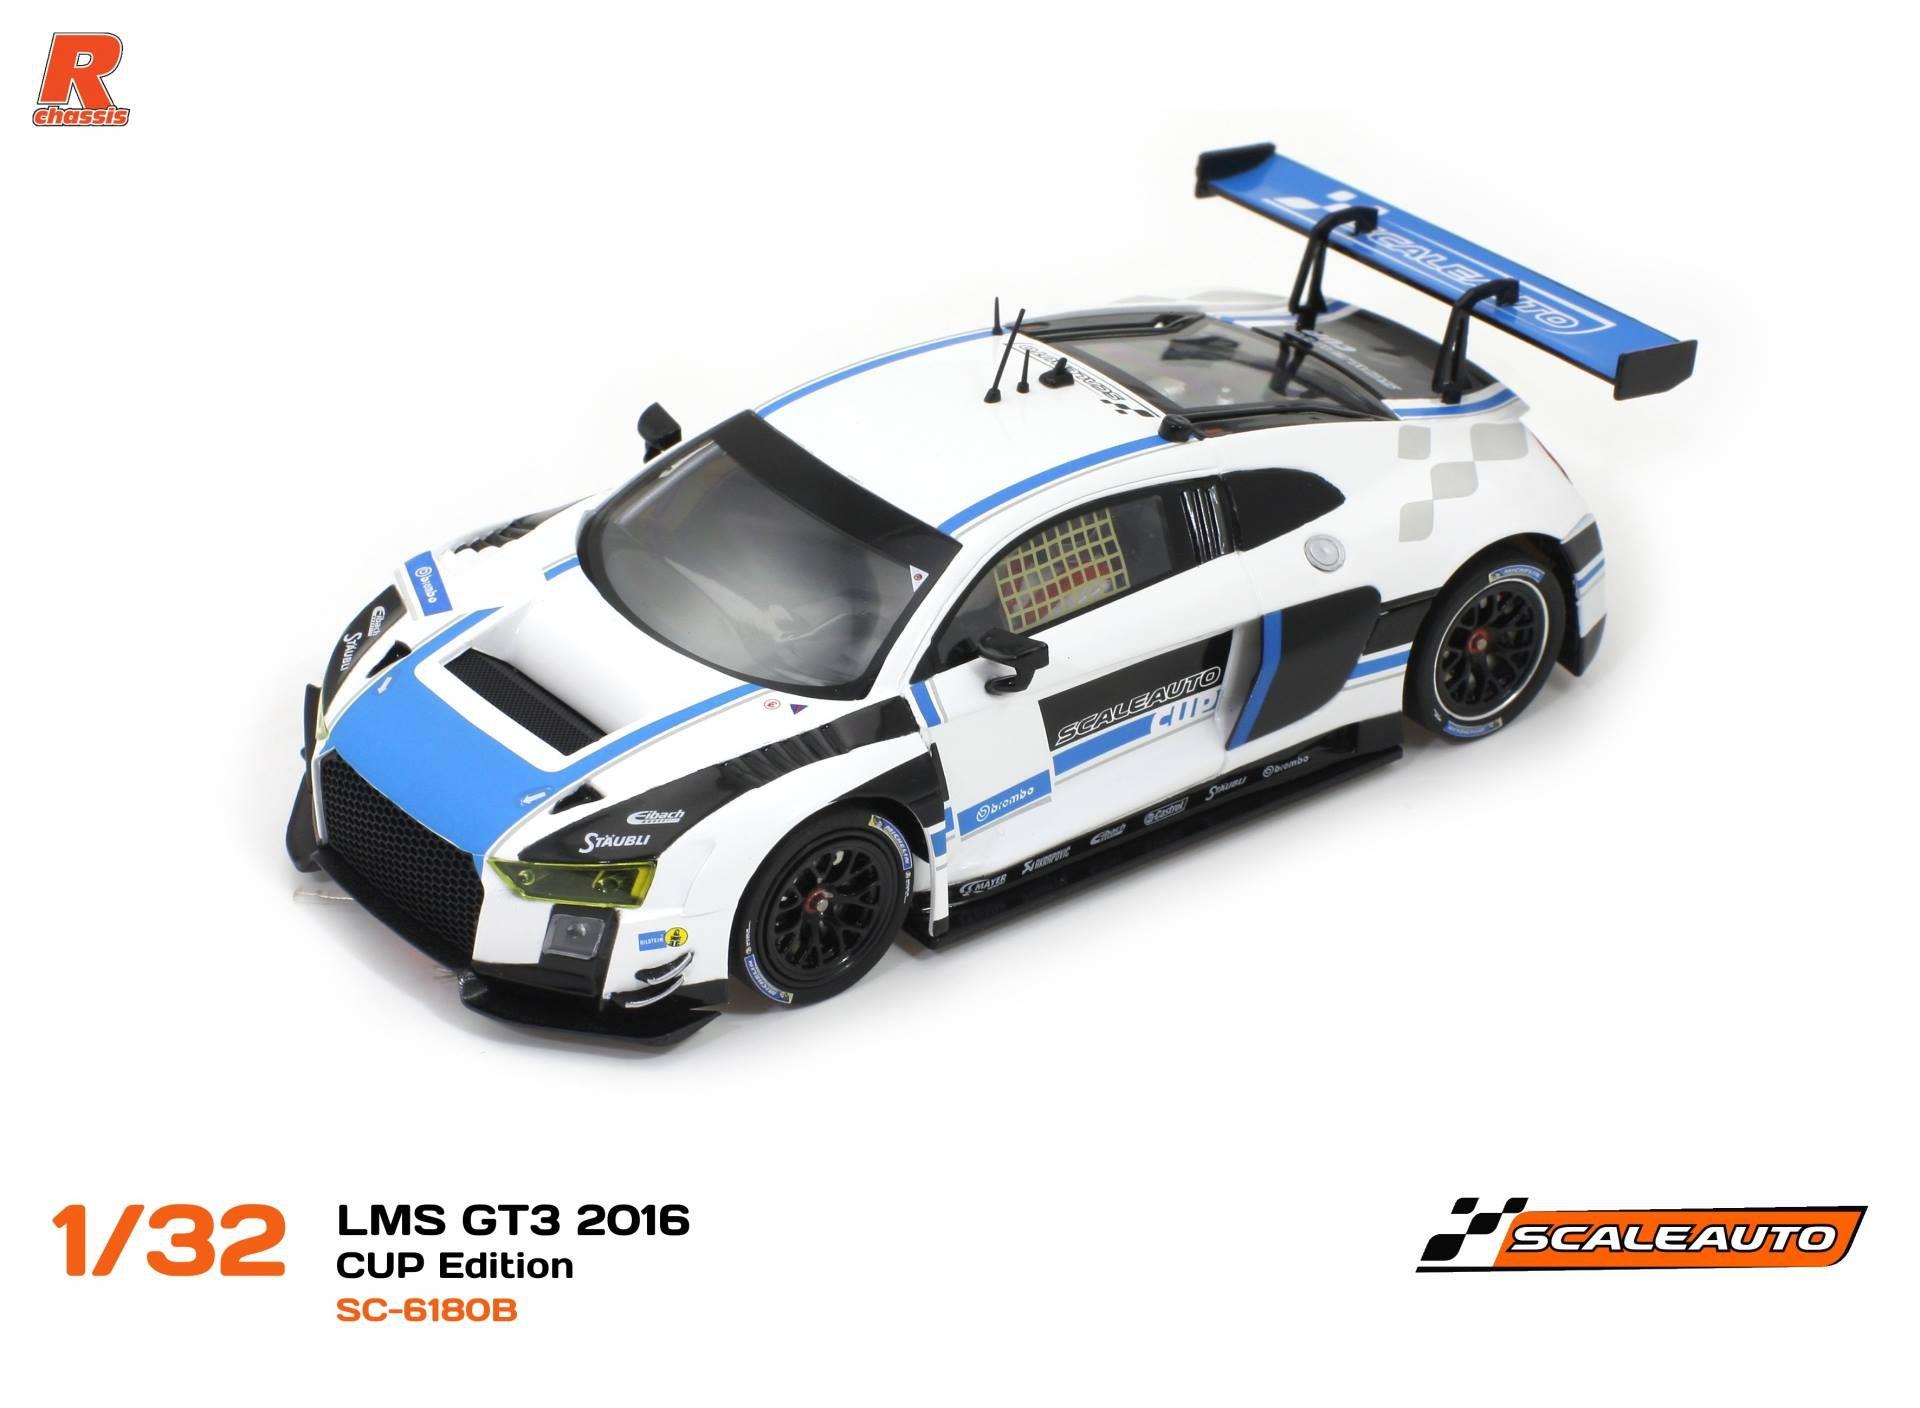 Scaleauto SC-6180B LMS GT3 2016 CUP Edition, blanco azul